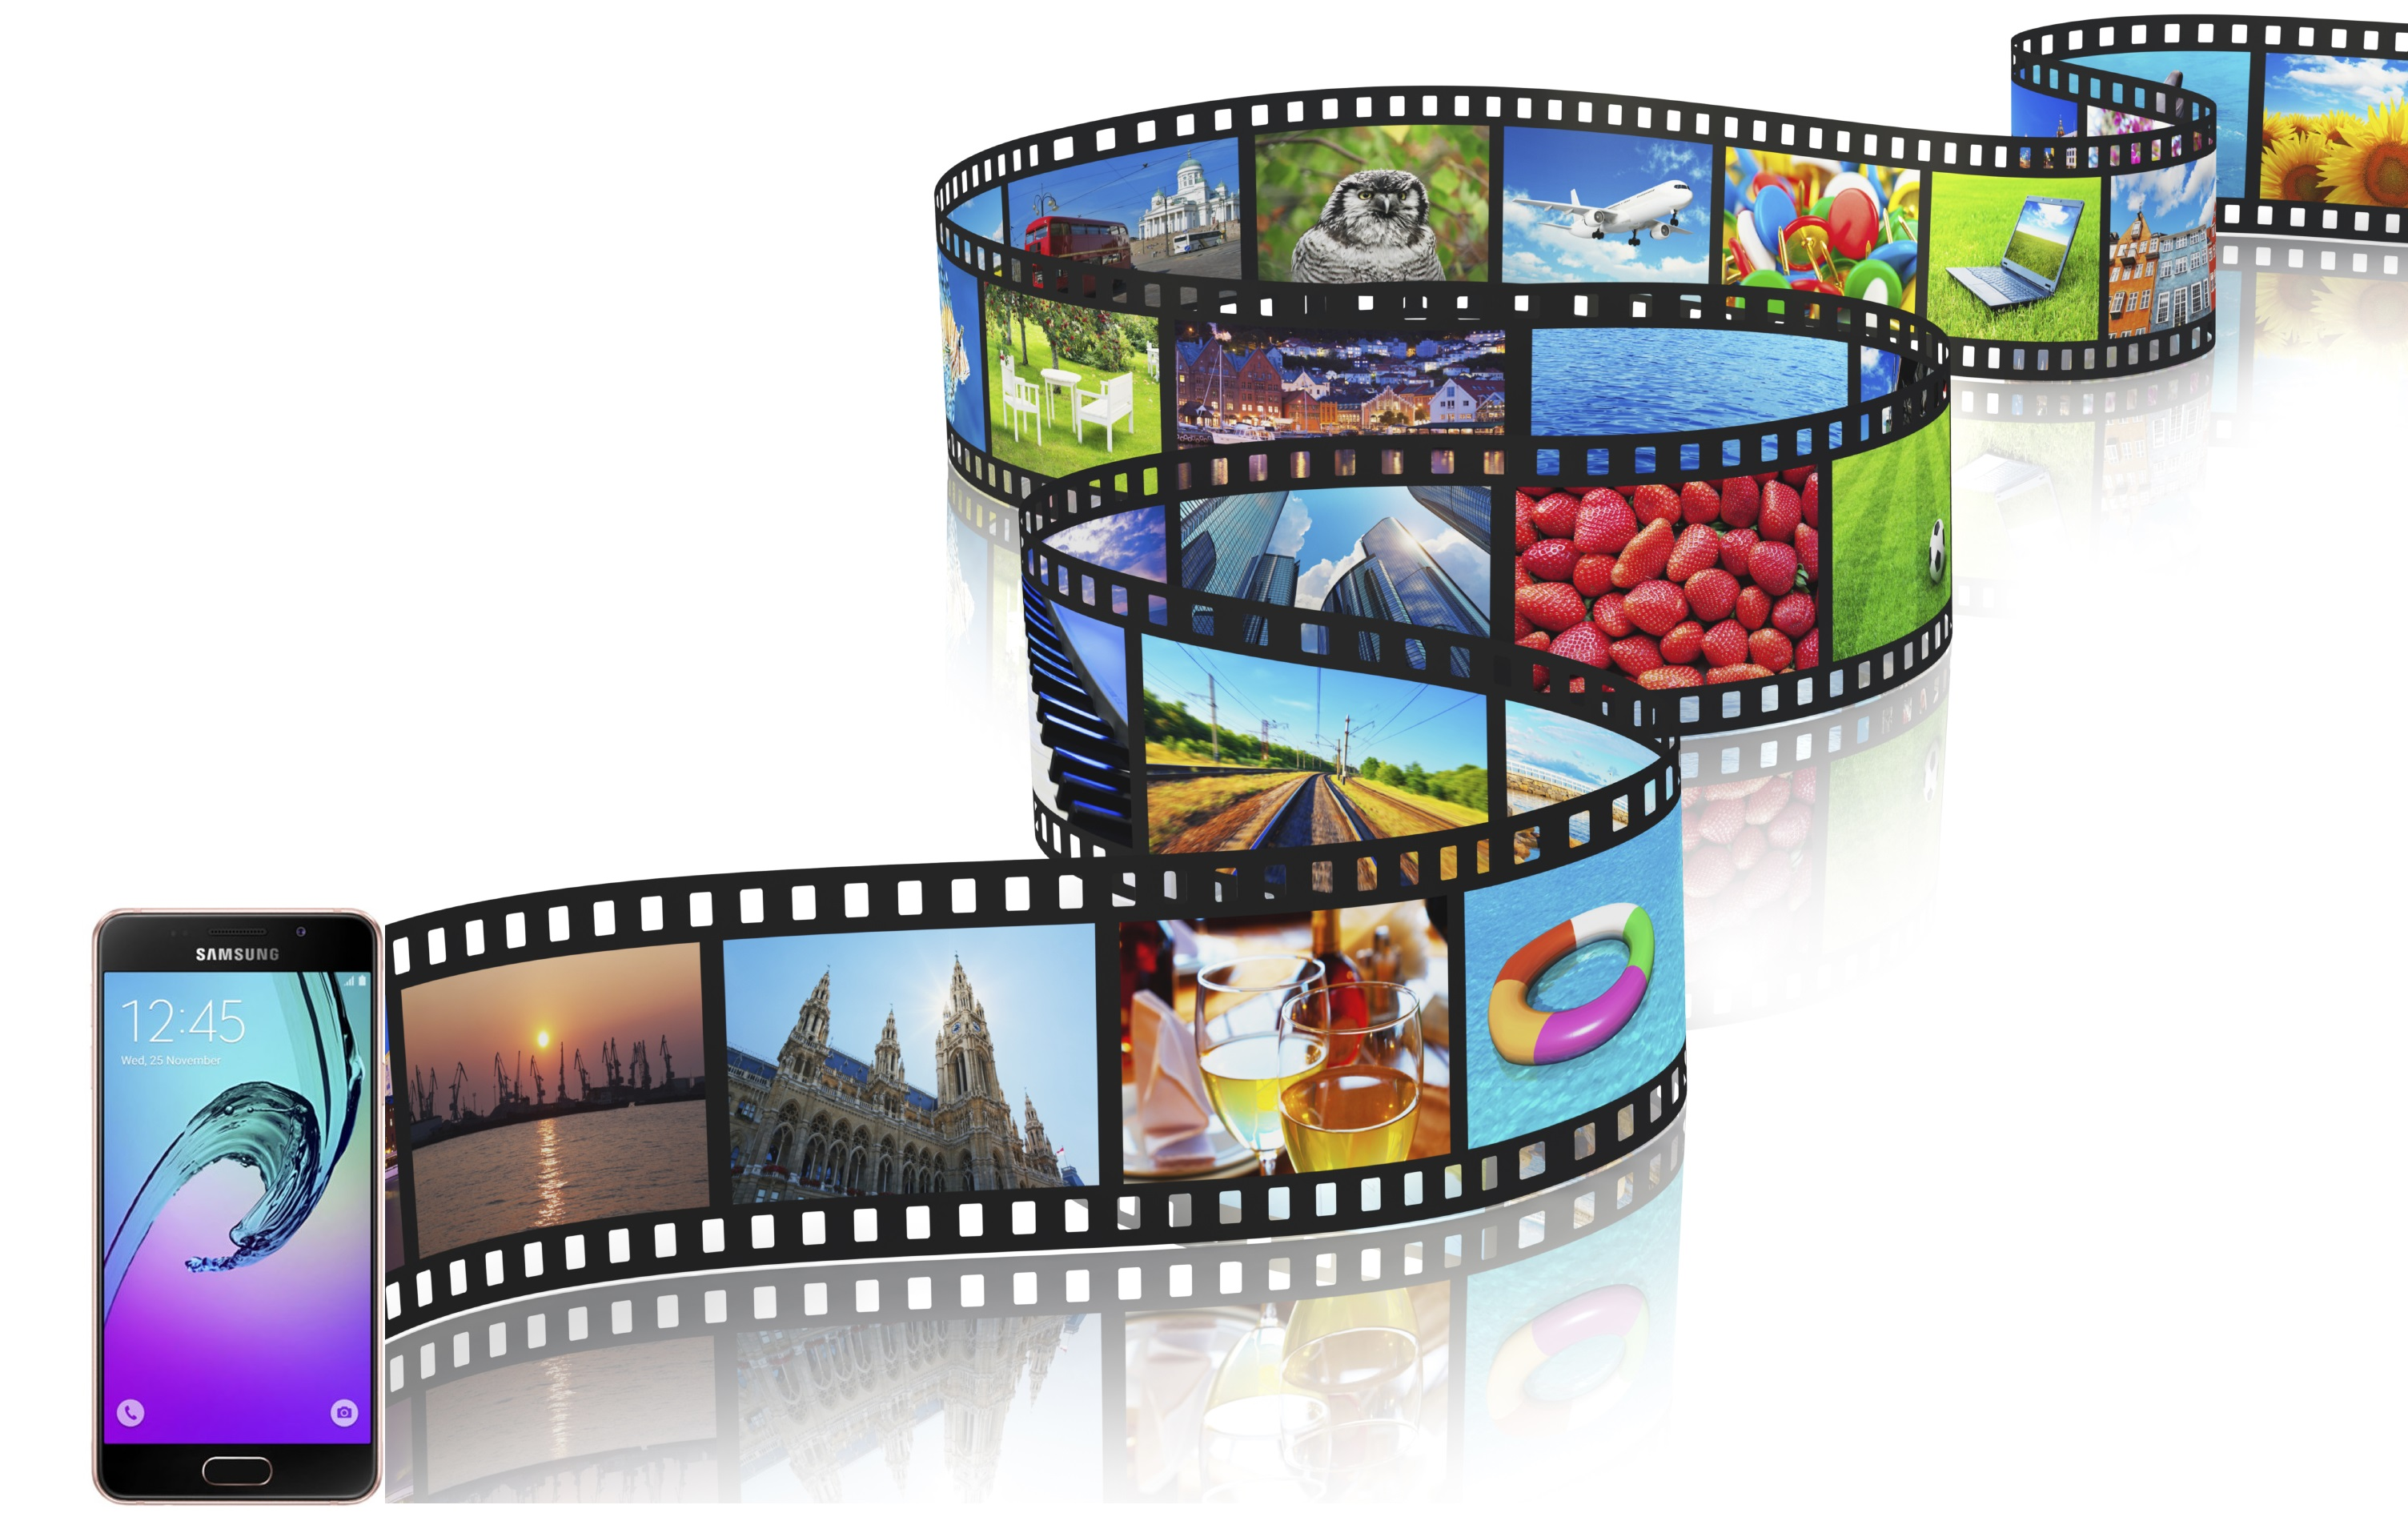 streaming video on demand smartphone - Tv, SVOD. USA: 80% consumo dati smartphone da streaming video